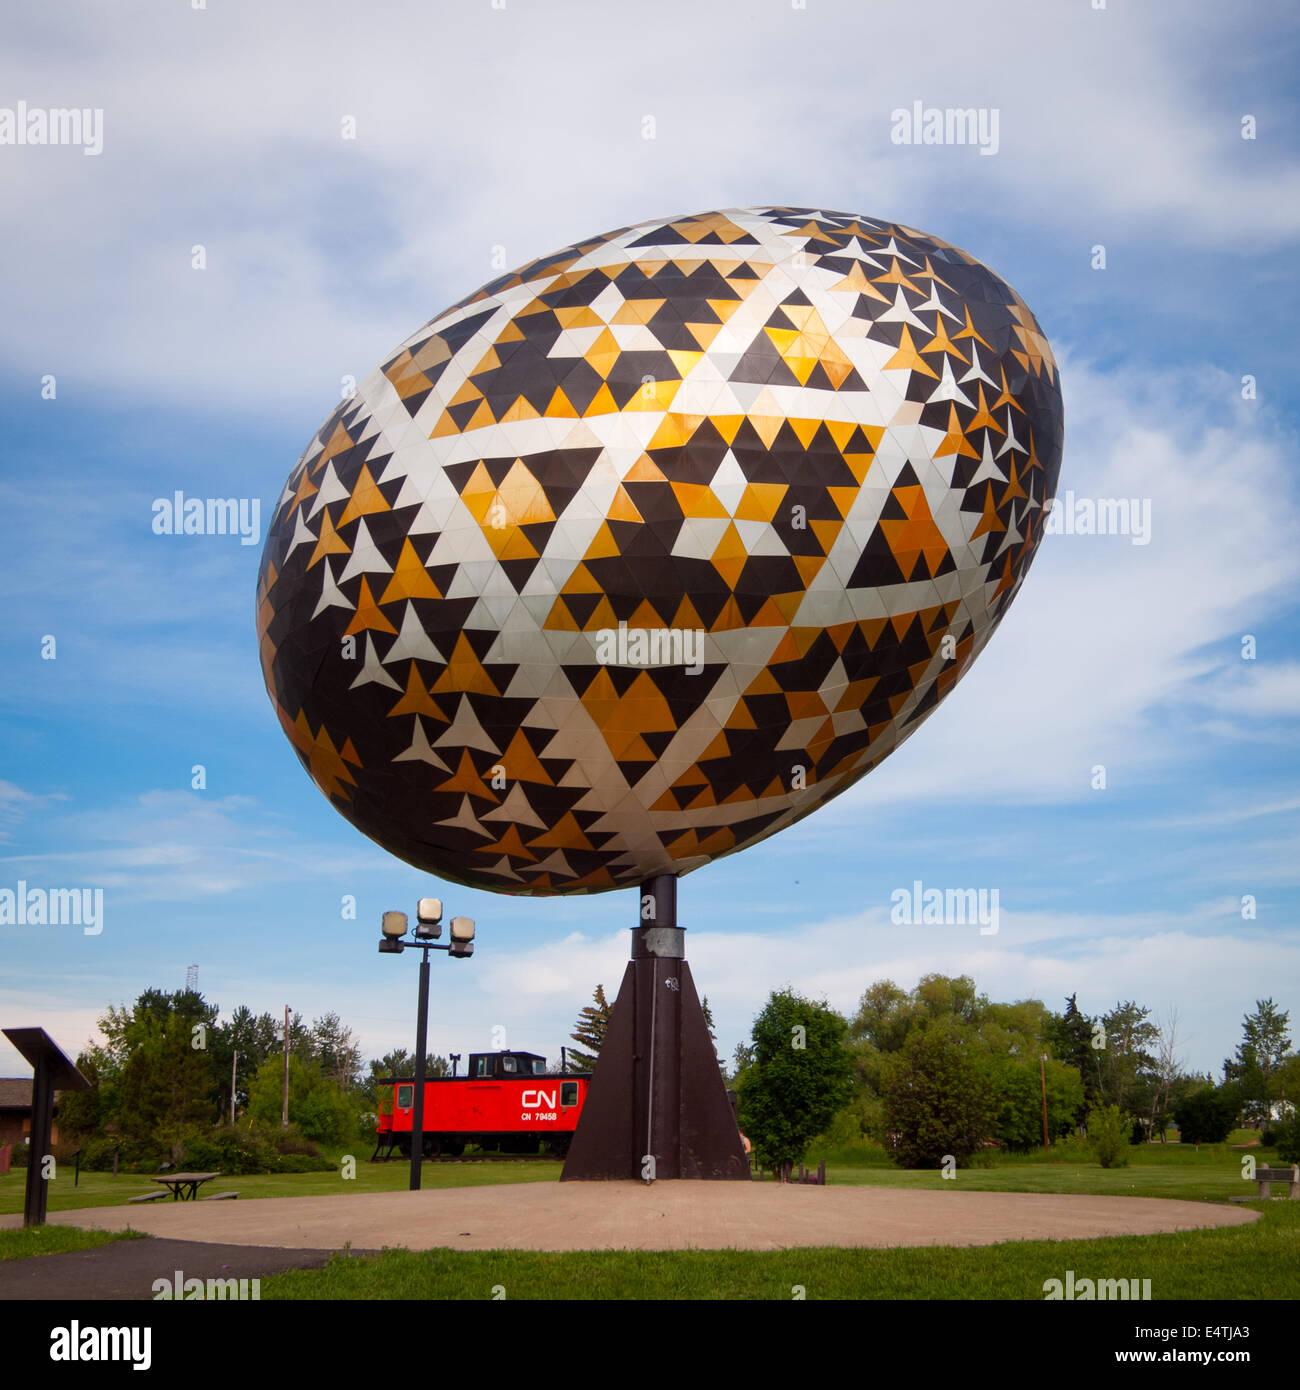 The Vegreville Egg, a giant (world's largest) sculpture of ...